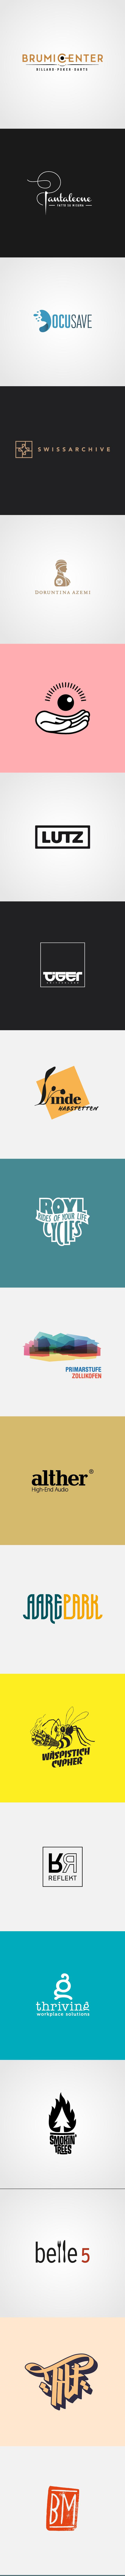 GLUNZ Projekt: alle mobile logo glunz